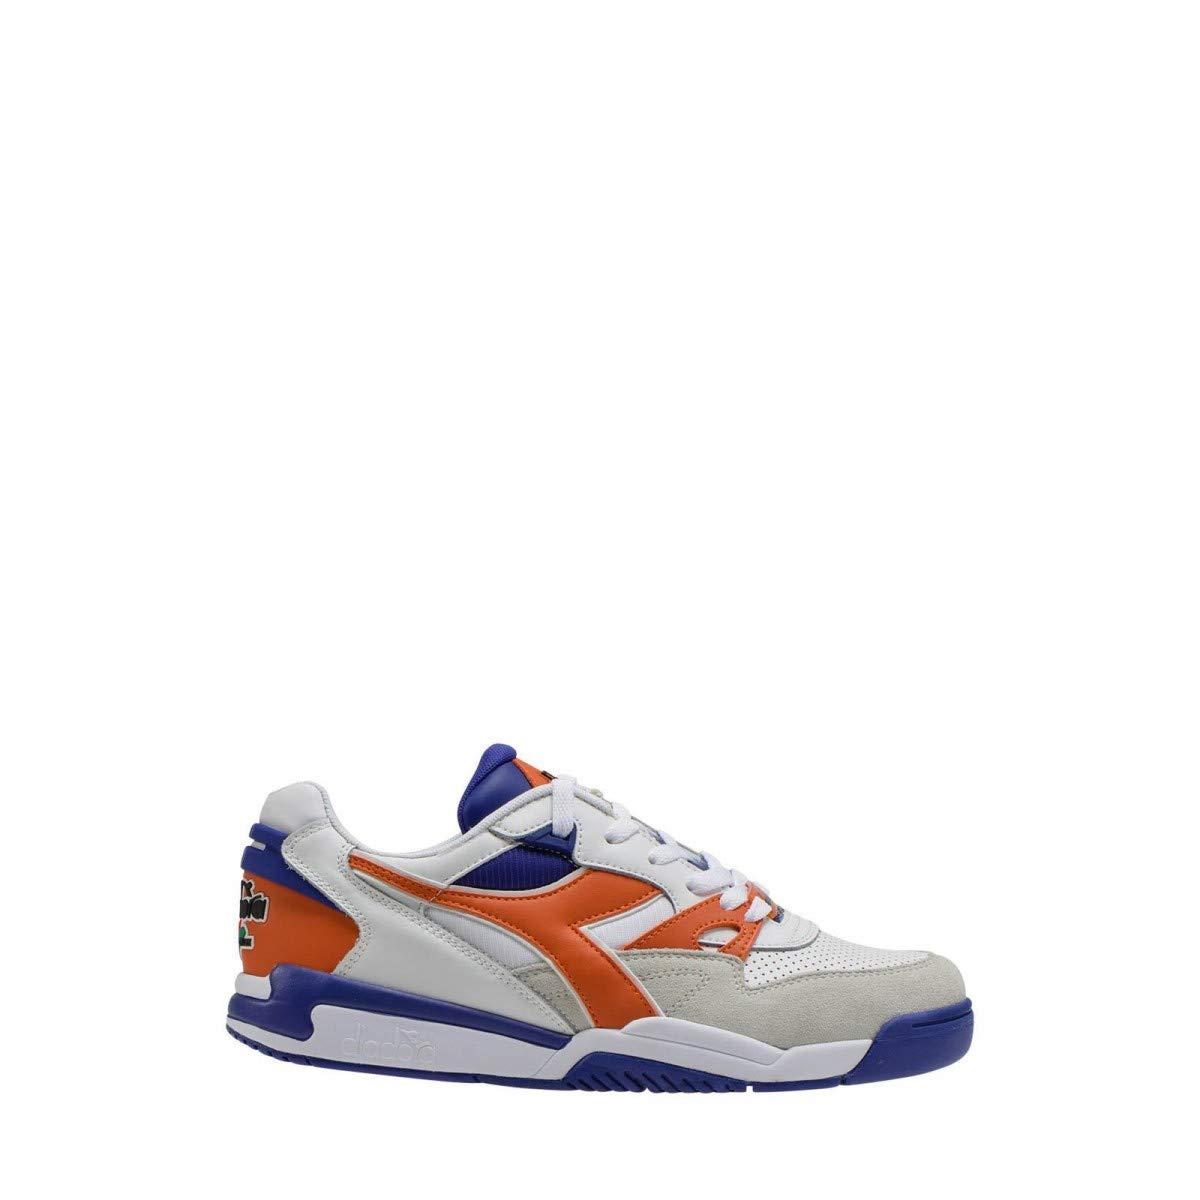 Sneakers uomo diadora rebound ace beta 501.175499.c6150